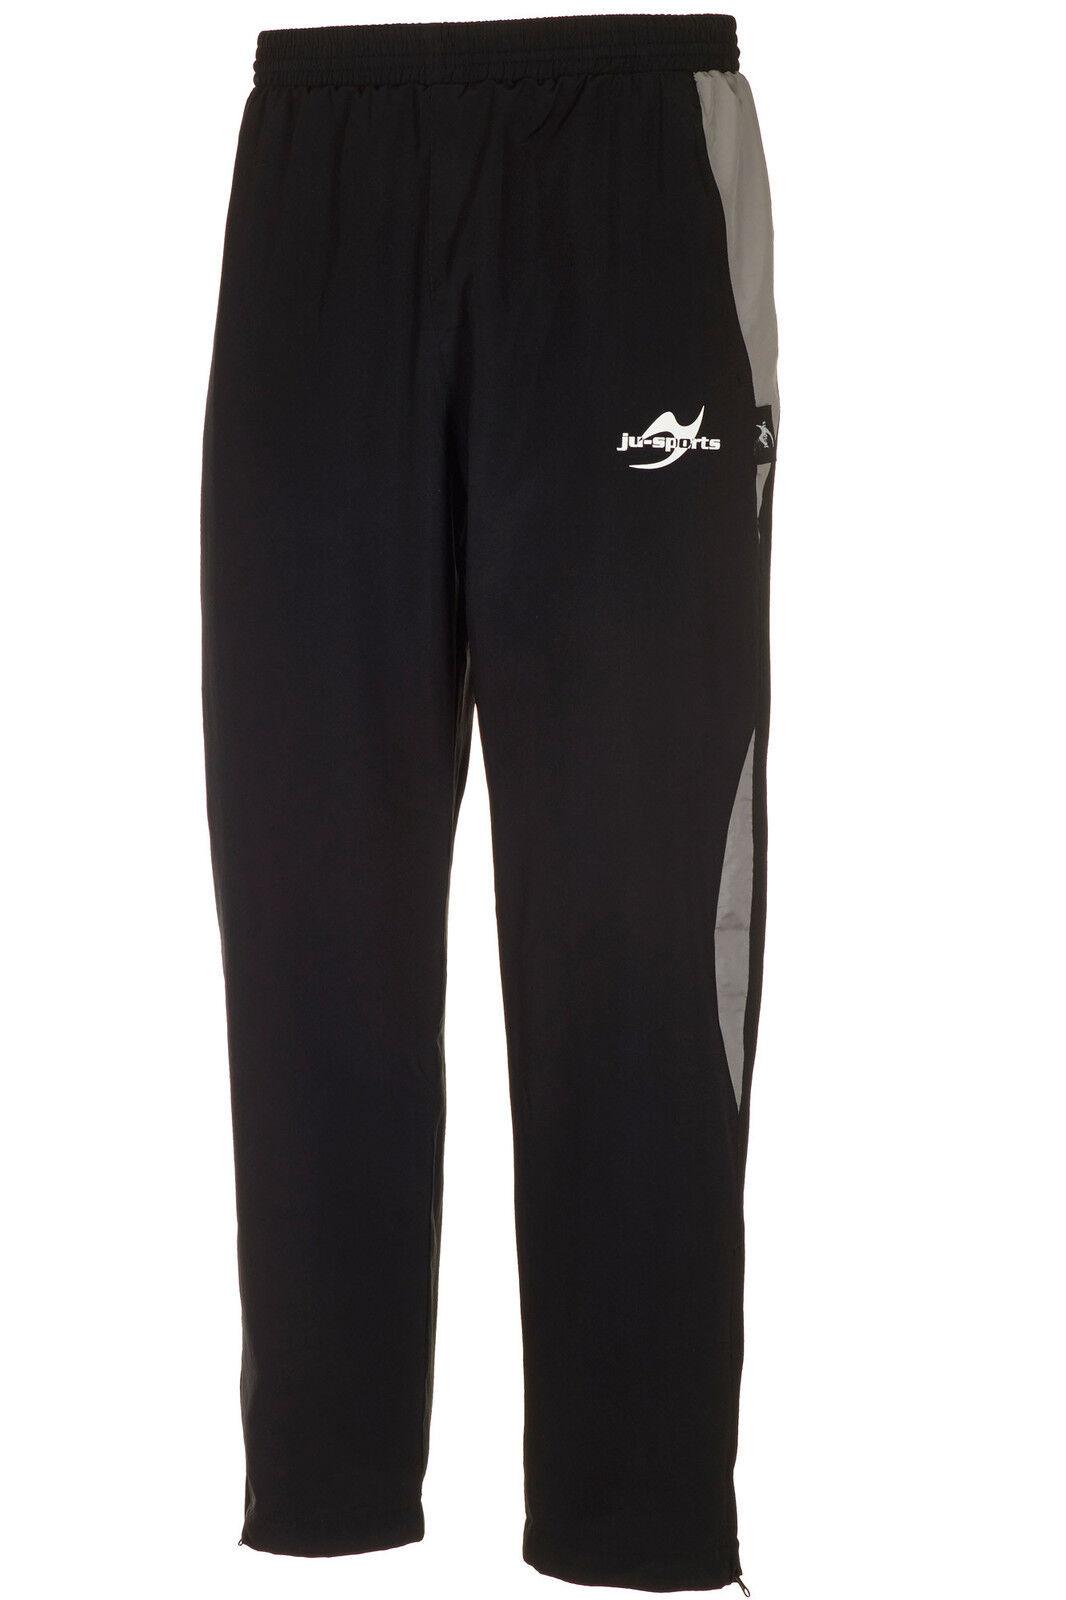 Ju-Sports Ju-Sports Ju-Sports Teamwear Element C1 Hose schwarz, Sporthose, Trainingshose, Team Wear  | Online-verkauf  84c995